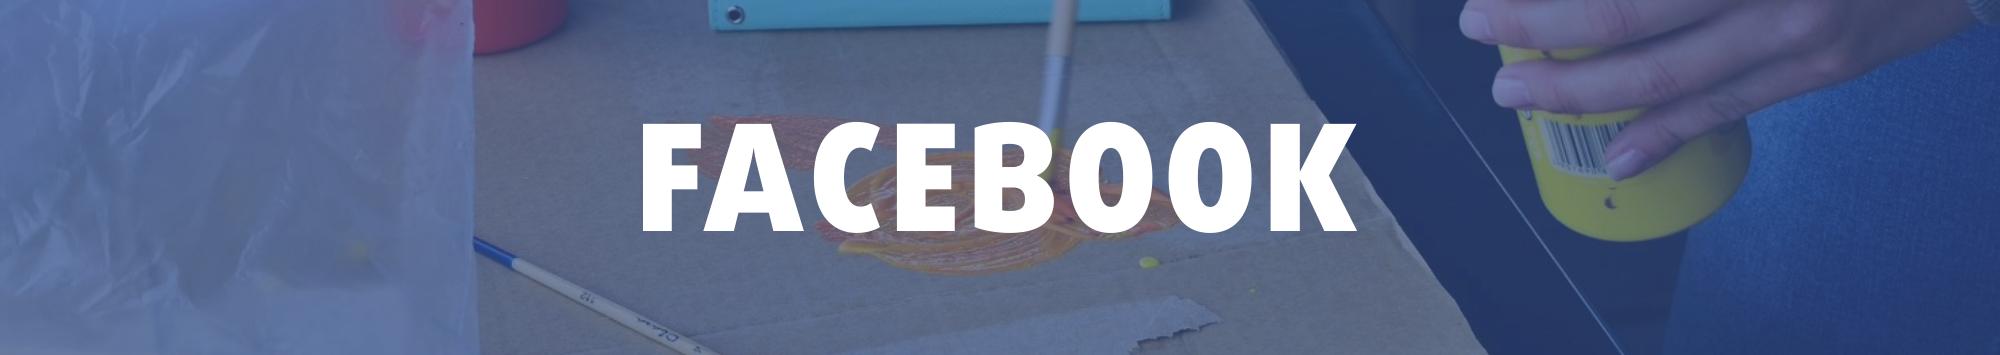 Facebook Fundacji KReAdukacja